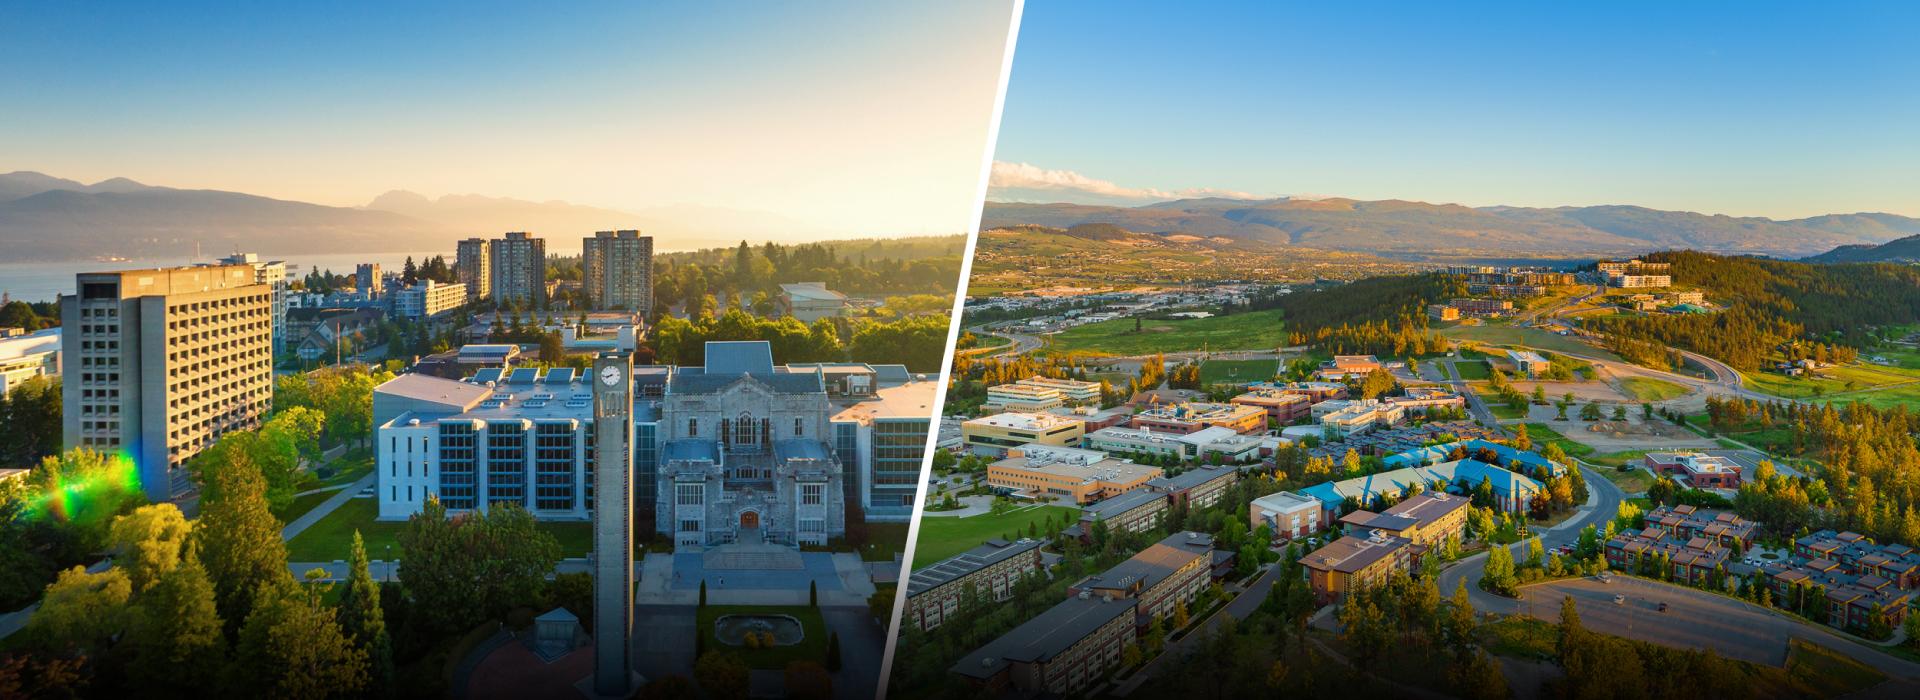 Dual campuses